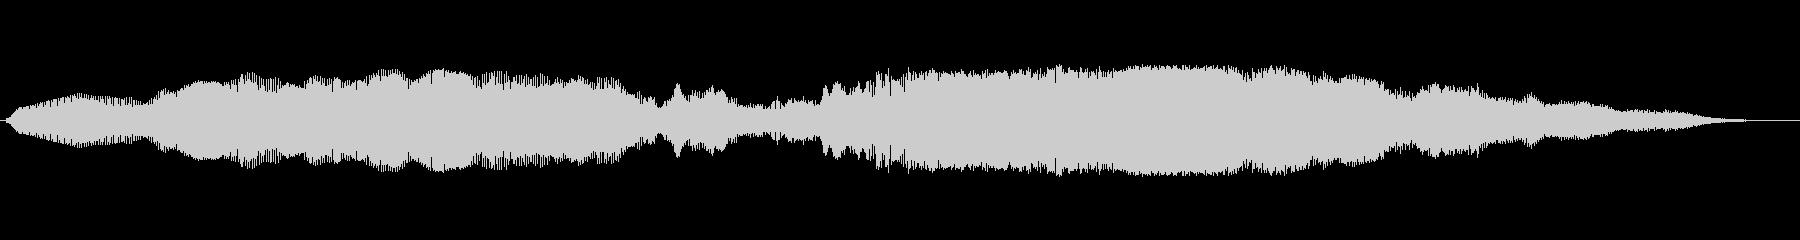 SynthVarious EC05...の未再生の波形